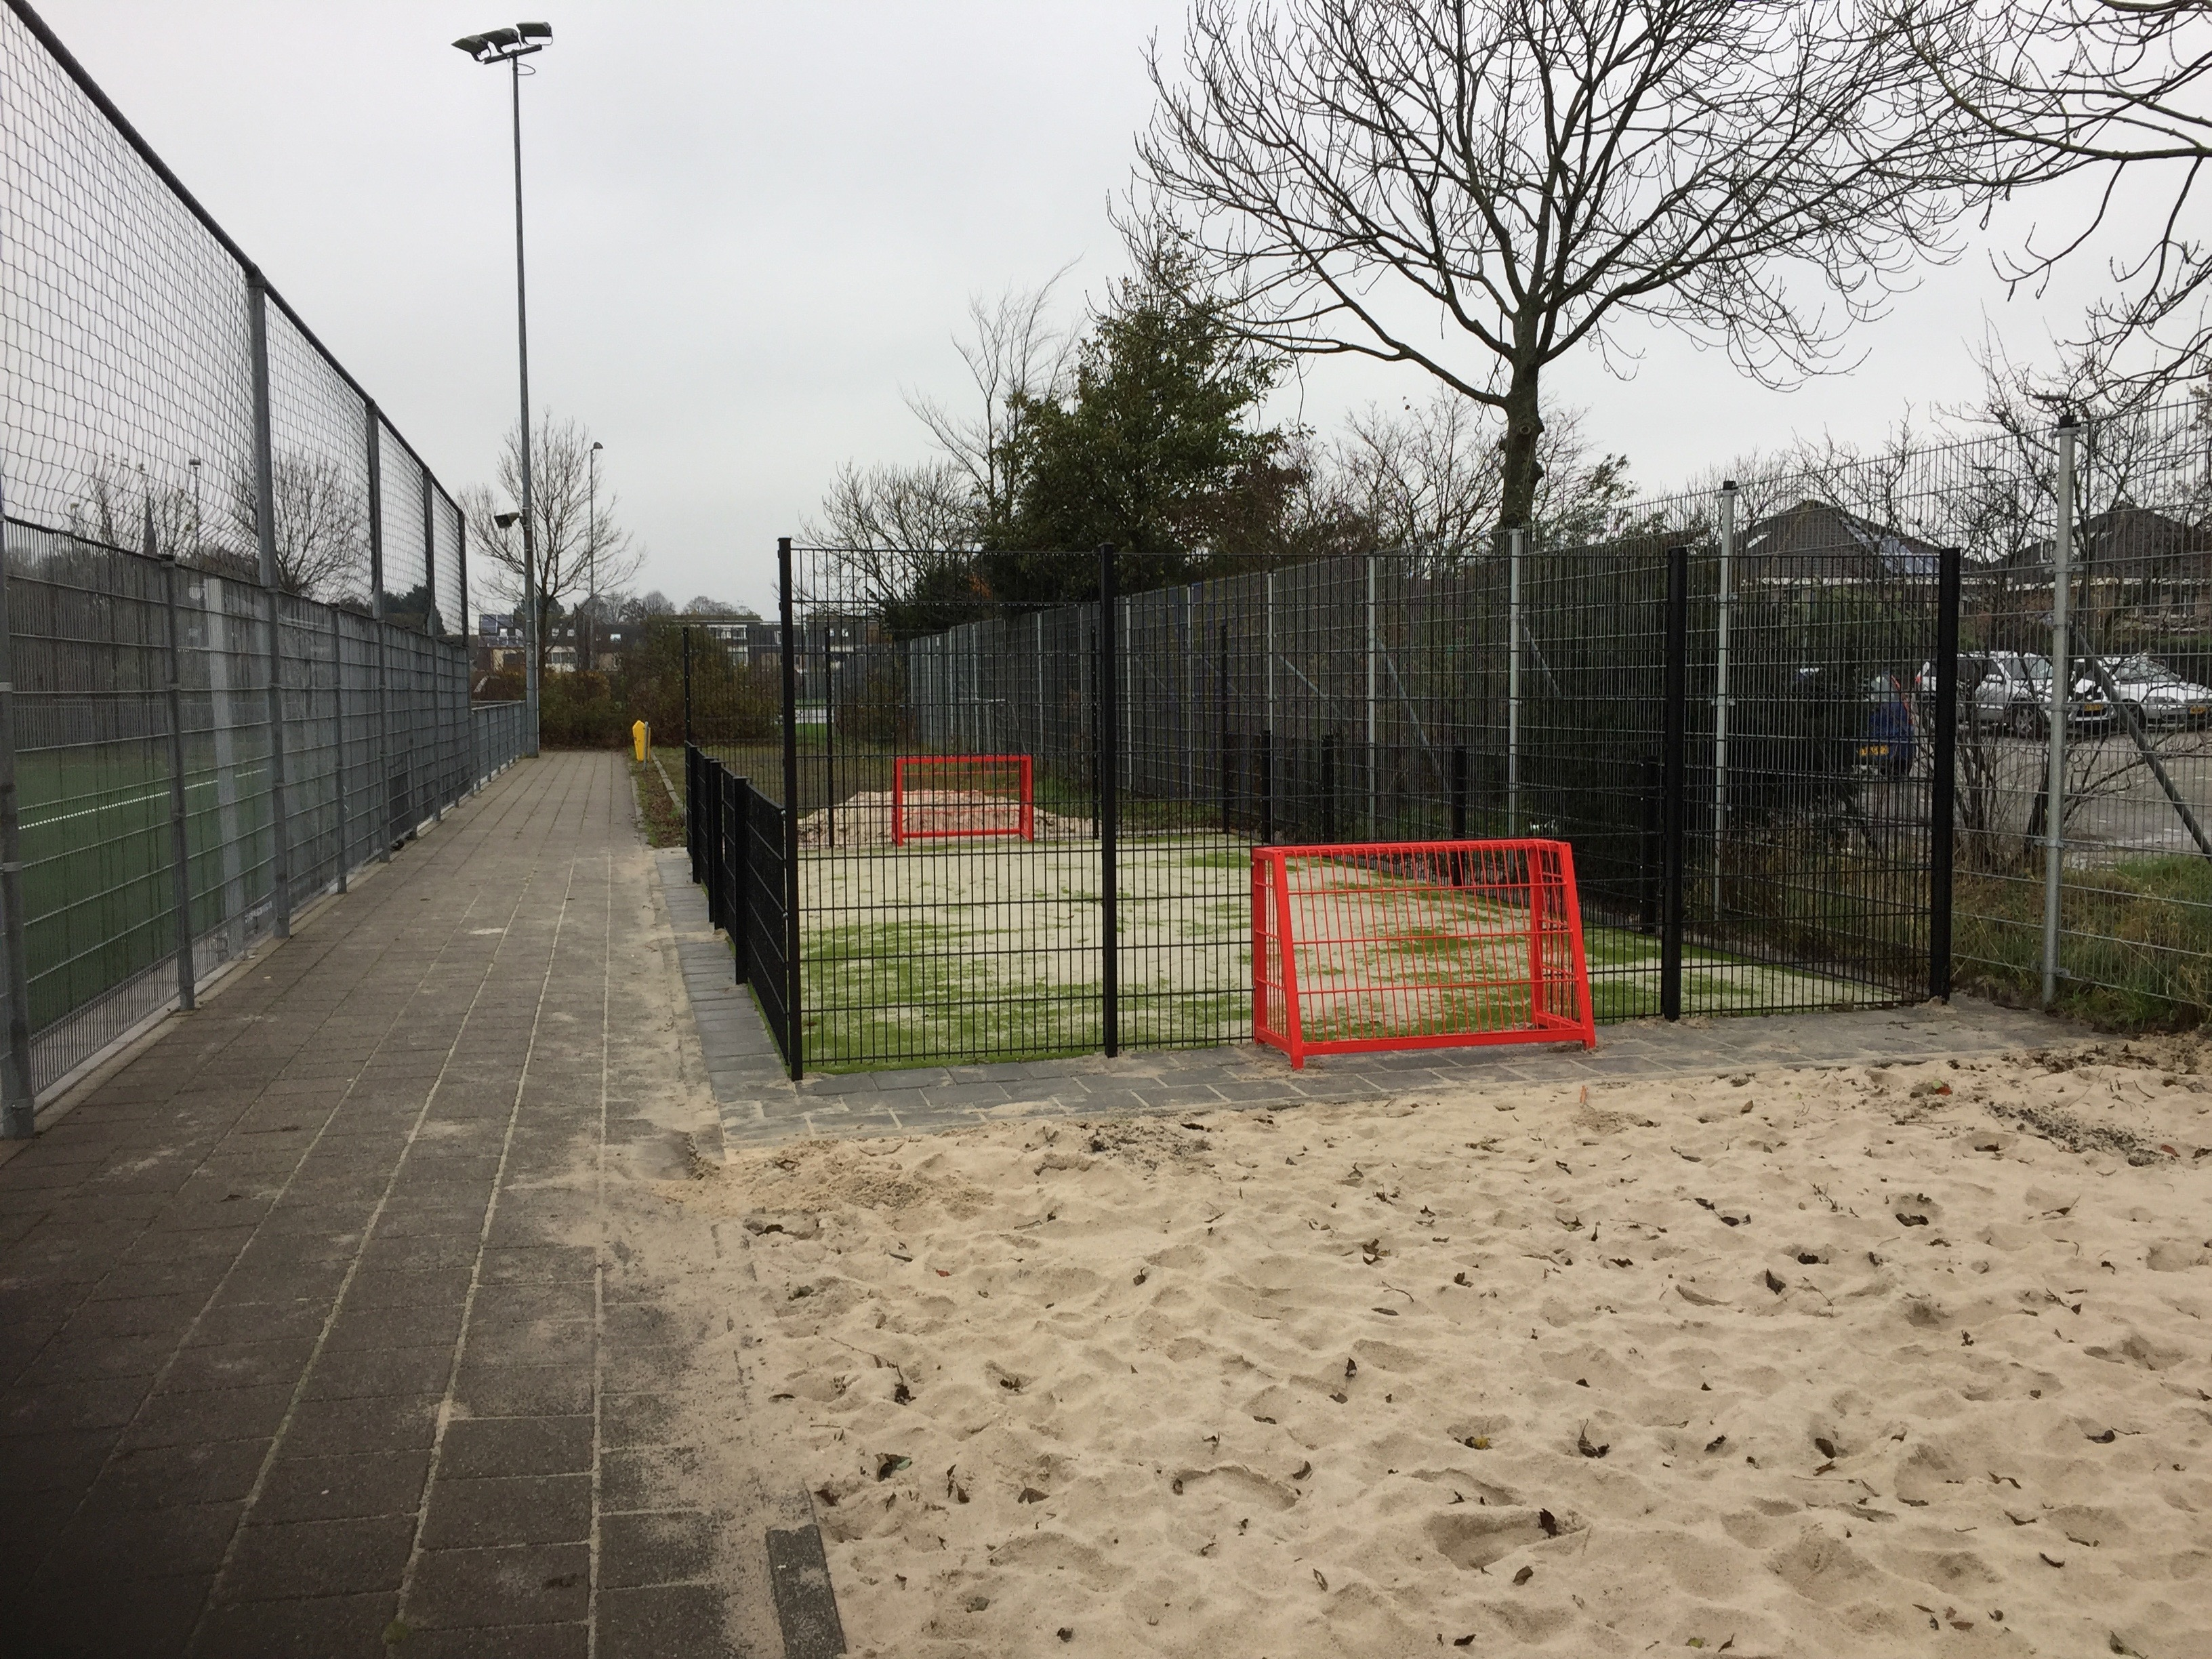 Foto Voetbalcourt 1 - Voetbalvereniging Stompwijk '92